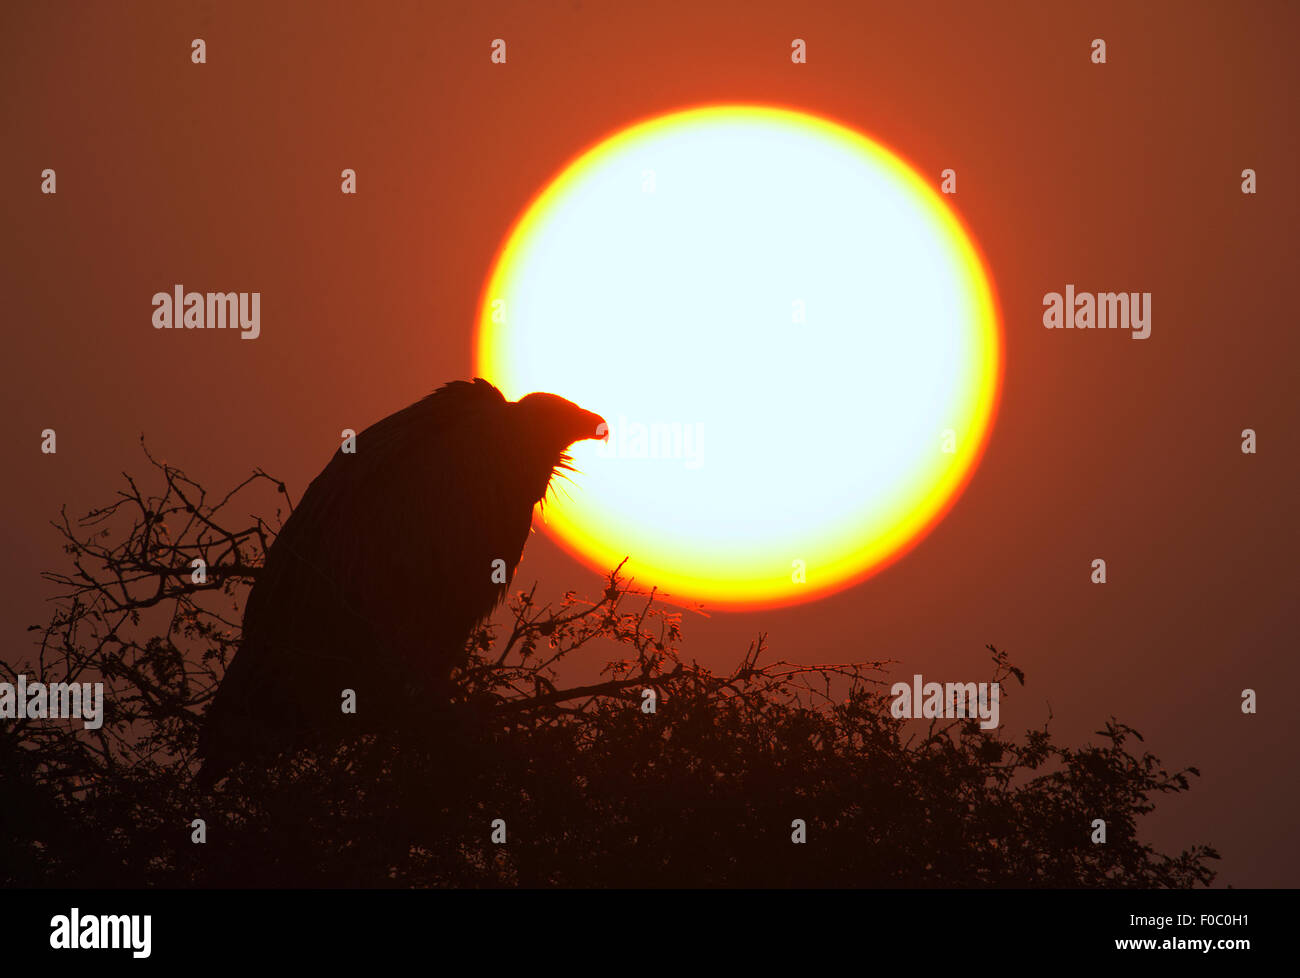 The image was shot near BIkaner-Rajsthan-India - Stock Image